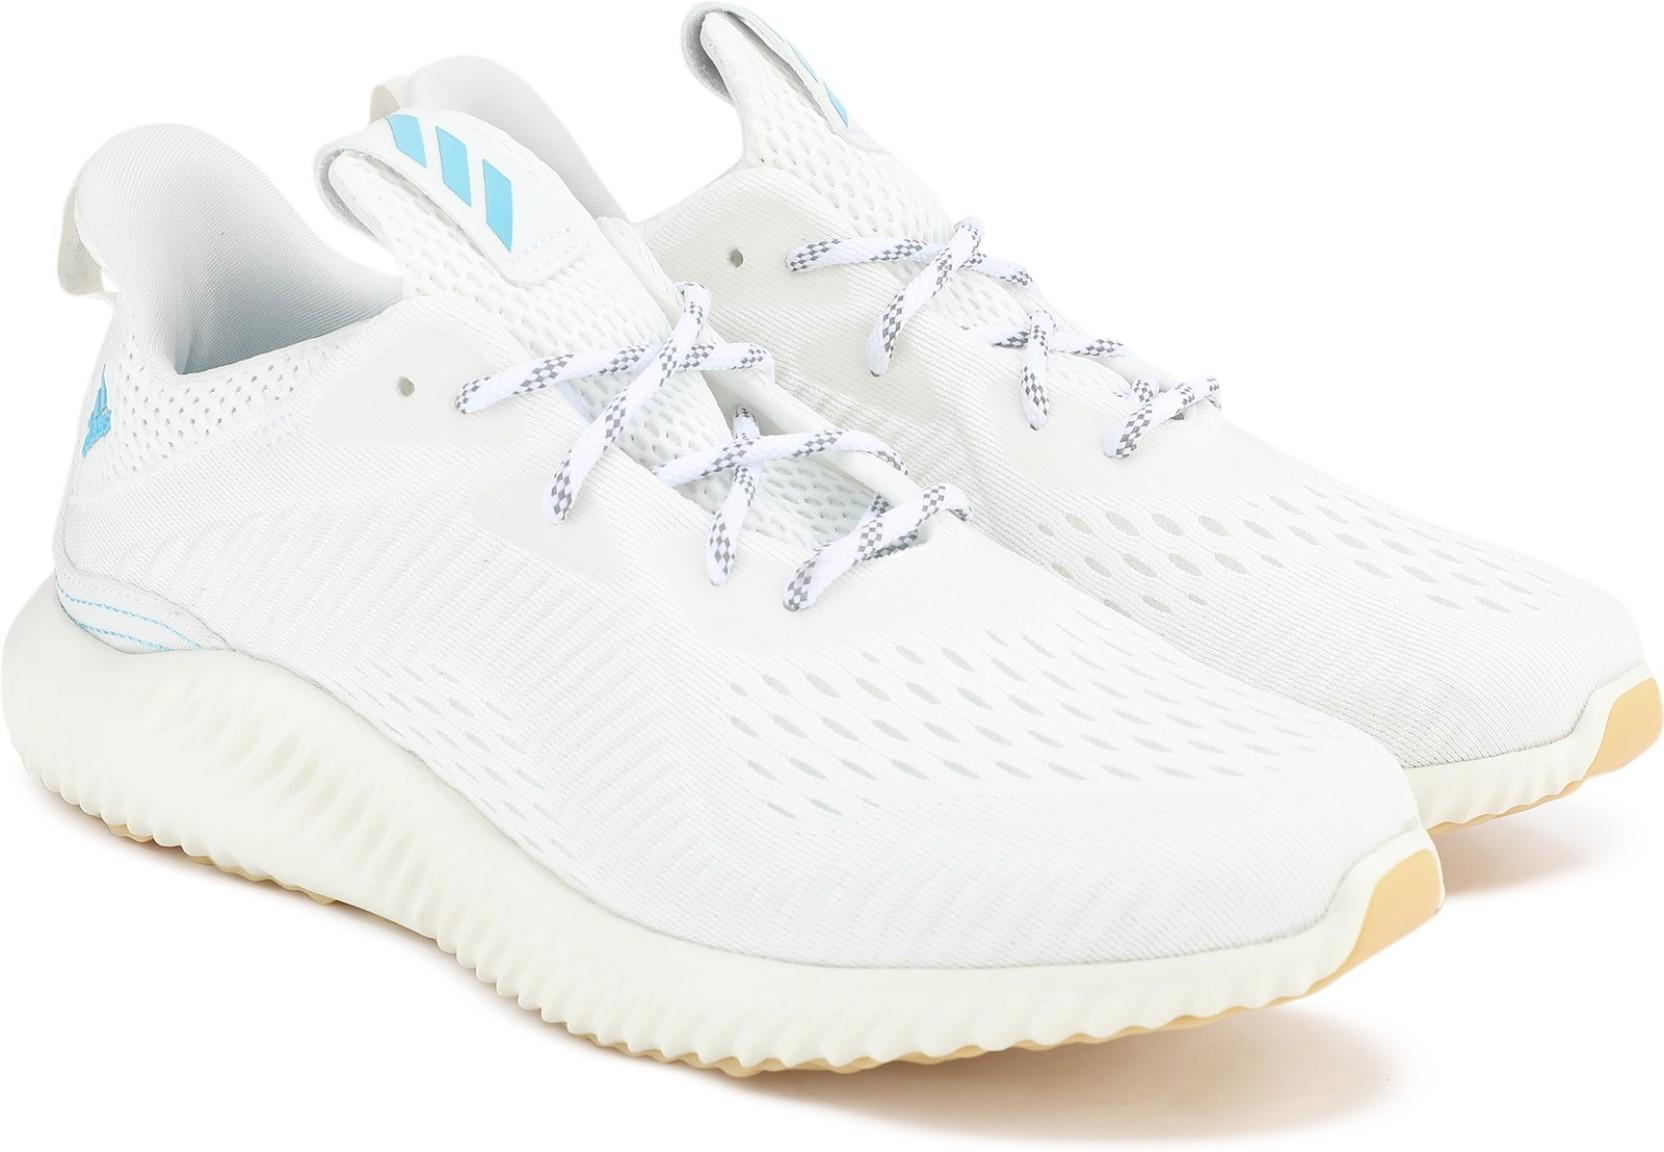 d6a1d2e4564d8 ADIDAS ALPHABOUNCE 1 PARLEY W Running Shoes For Women - Buy Blue ...